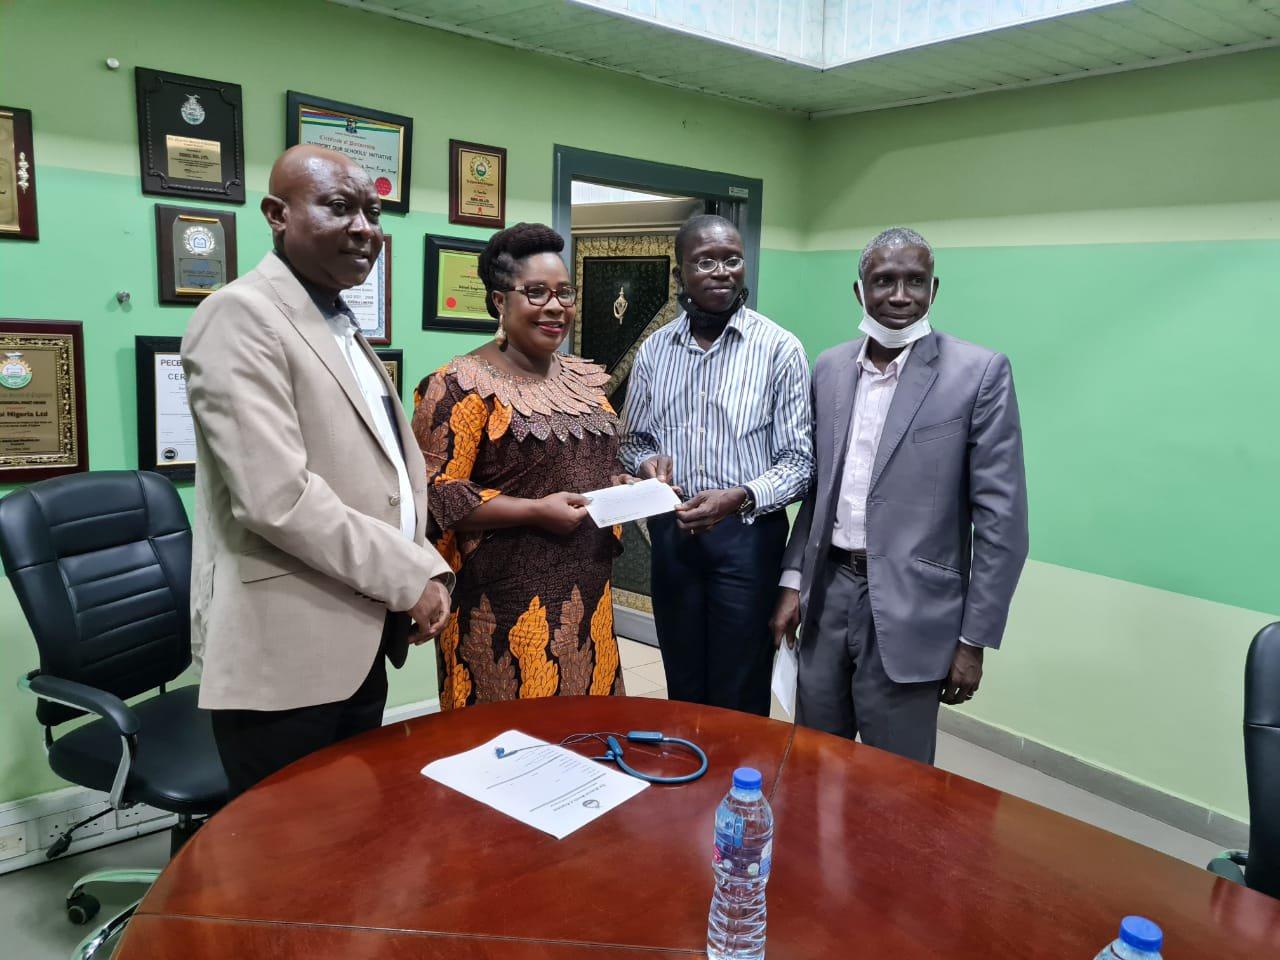 Oguntala to Chair Yabatech International  Conference; as School of Engineering Visits Kenol Limited